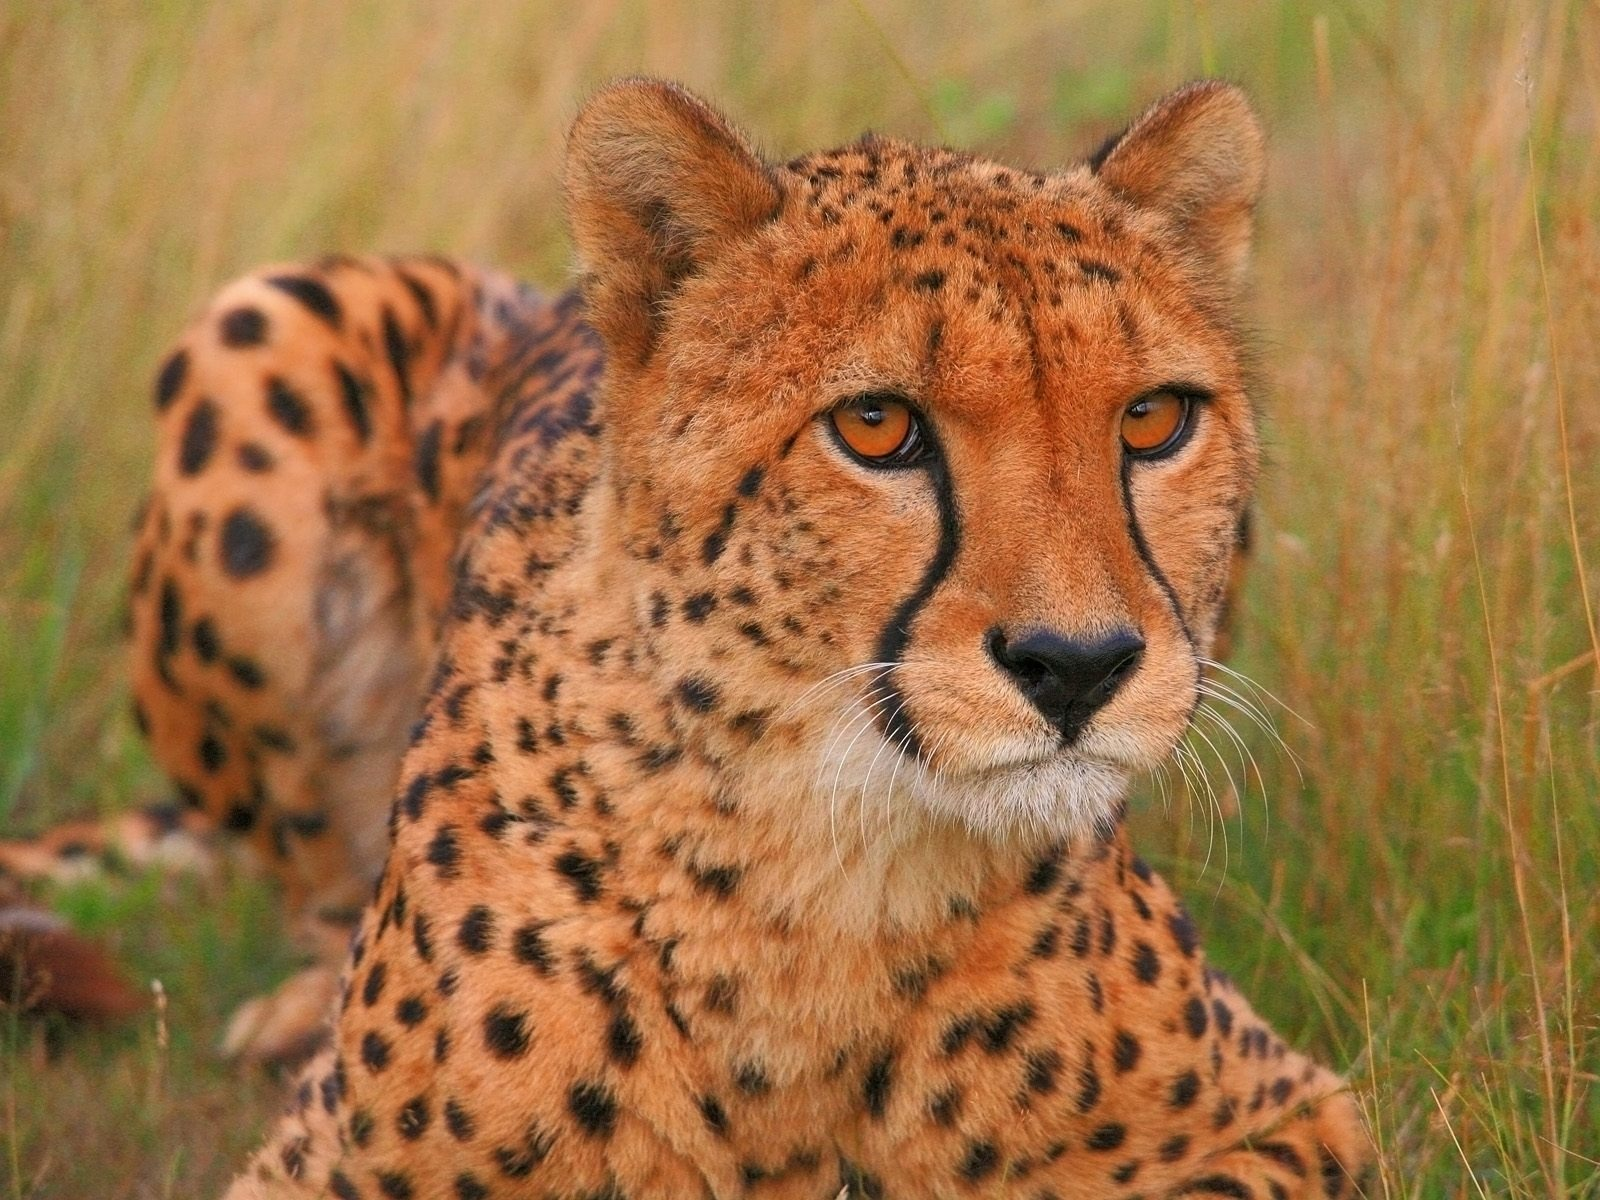 Animated Cheetah Wallpaper pepo the cheetah wallpaper cheetahs animals wallpapers in